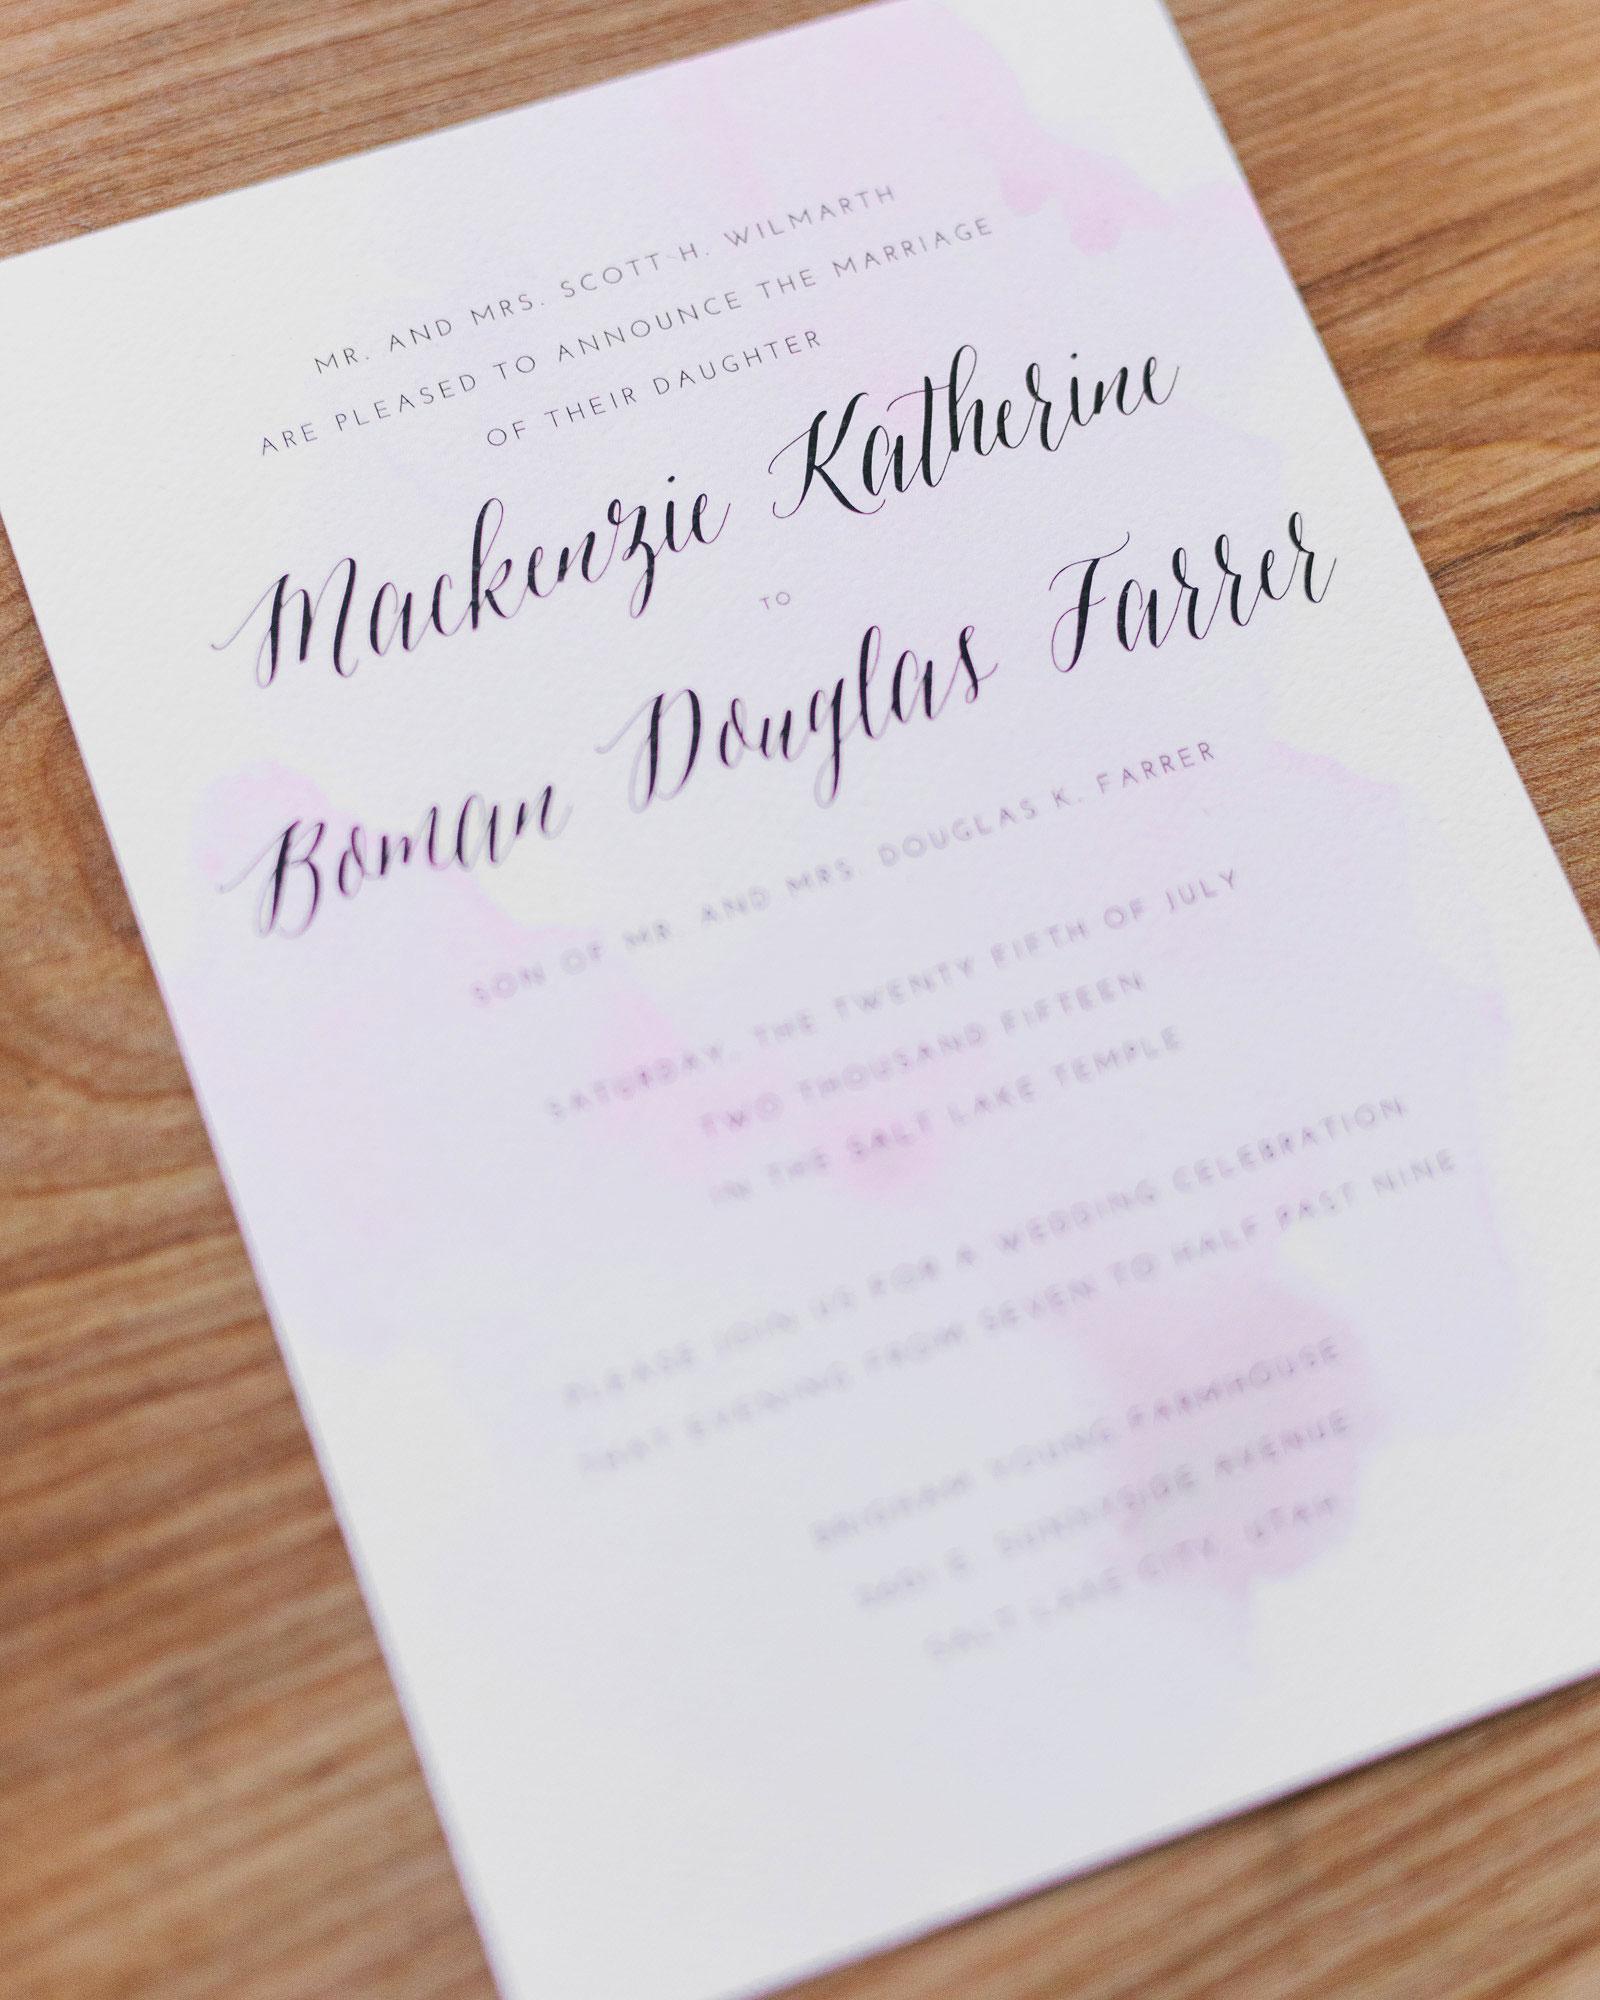 mackenzie-boman-wedding-invite-199-s112693-0316.jpg